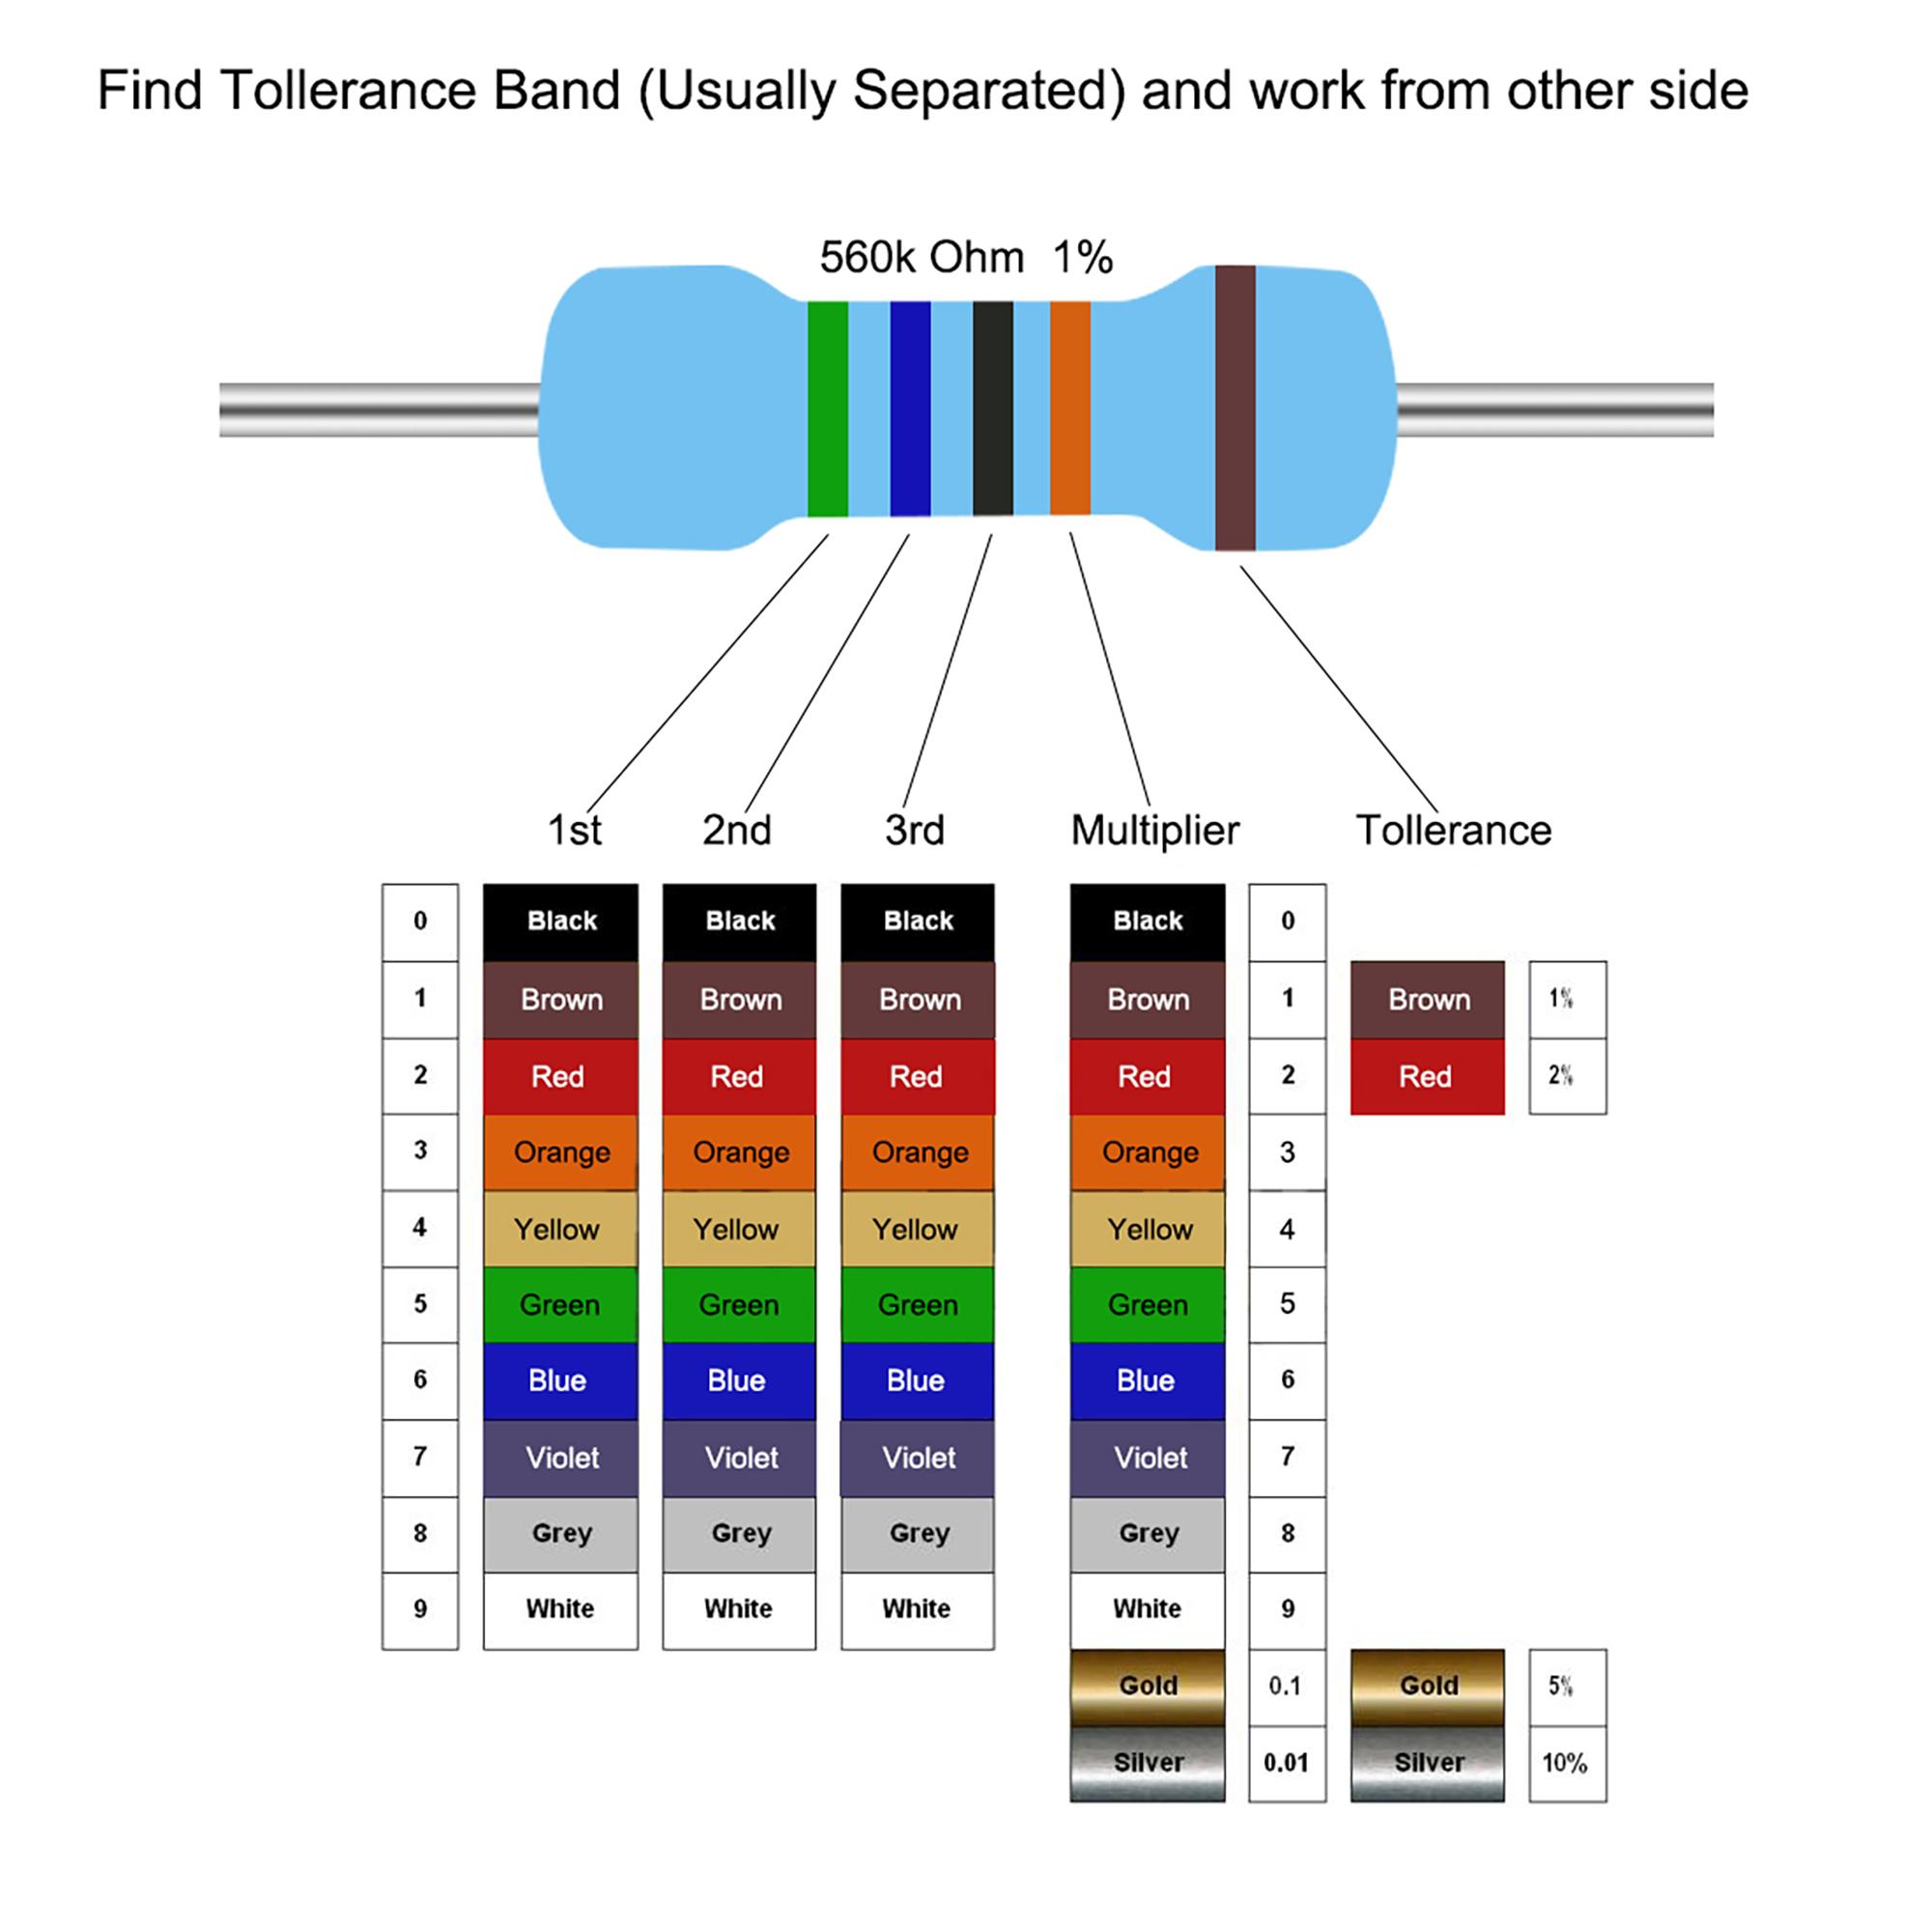 Metal Film Resistors 510 Ohm 1W 1% Tolerances 5Color Bands Pack of 200 - image 1 of 4